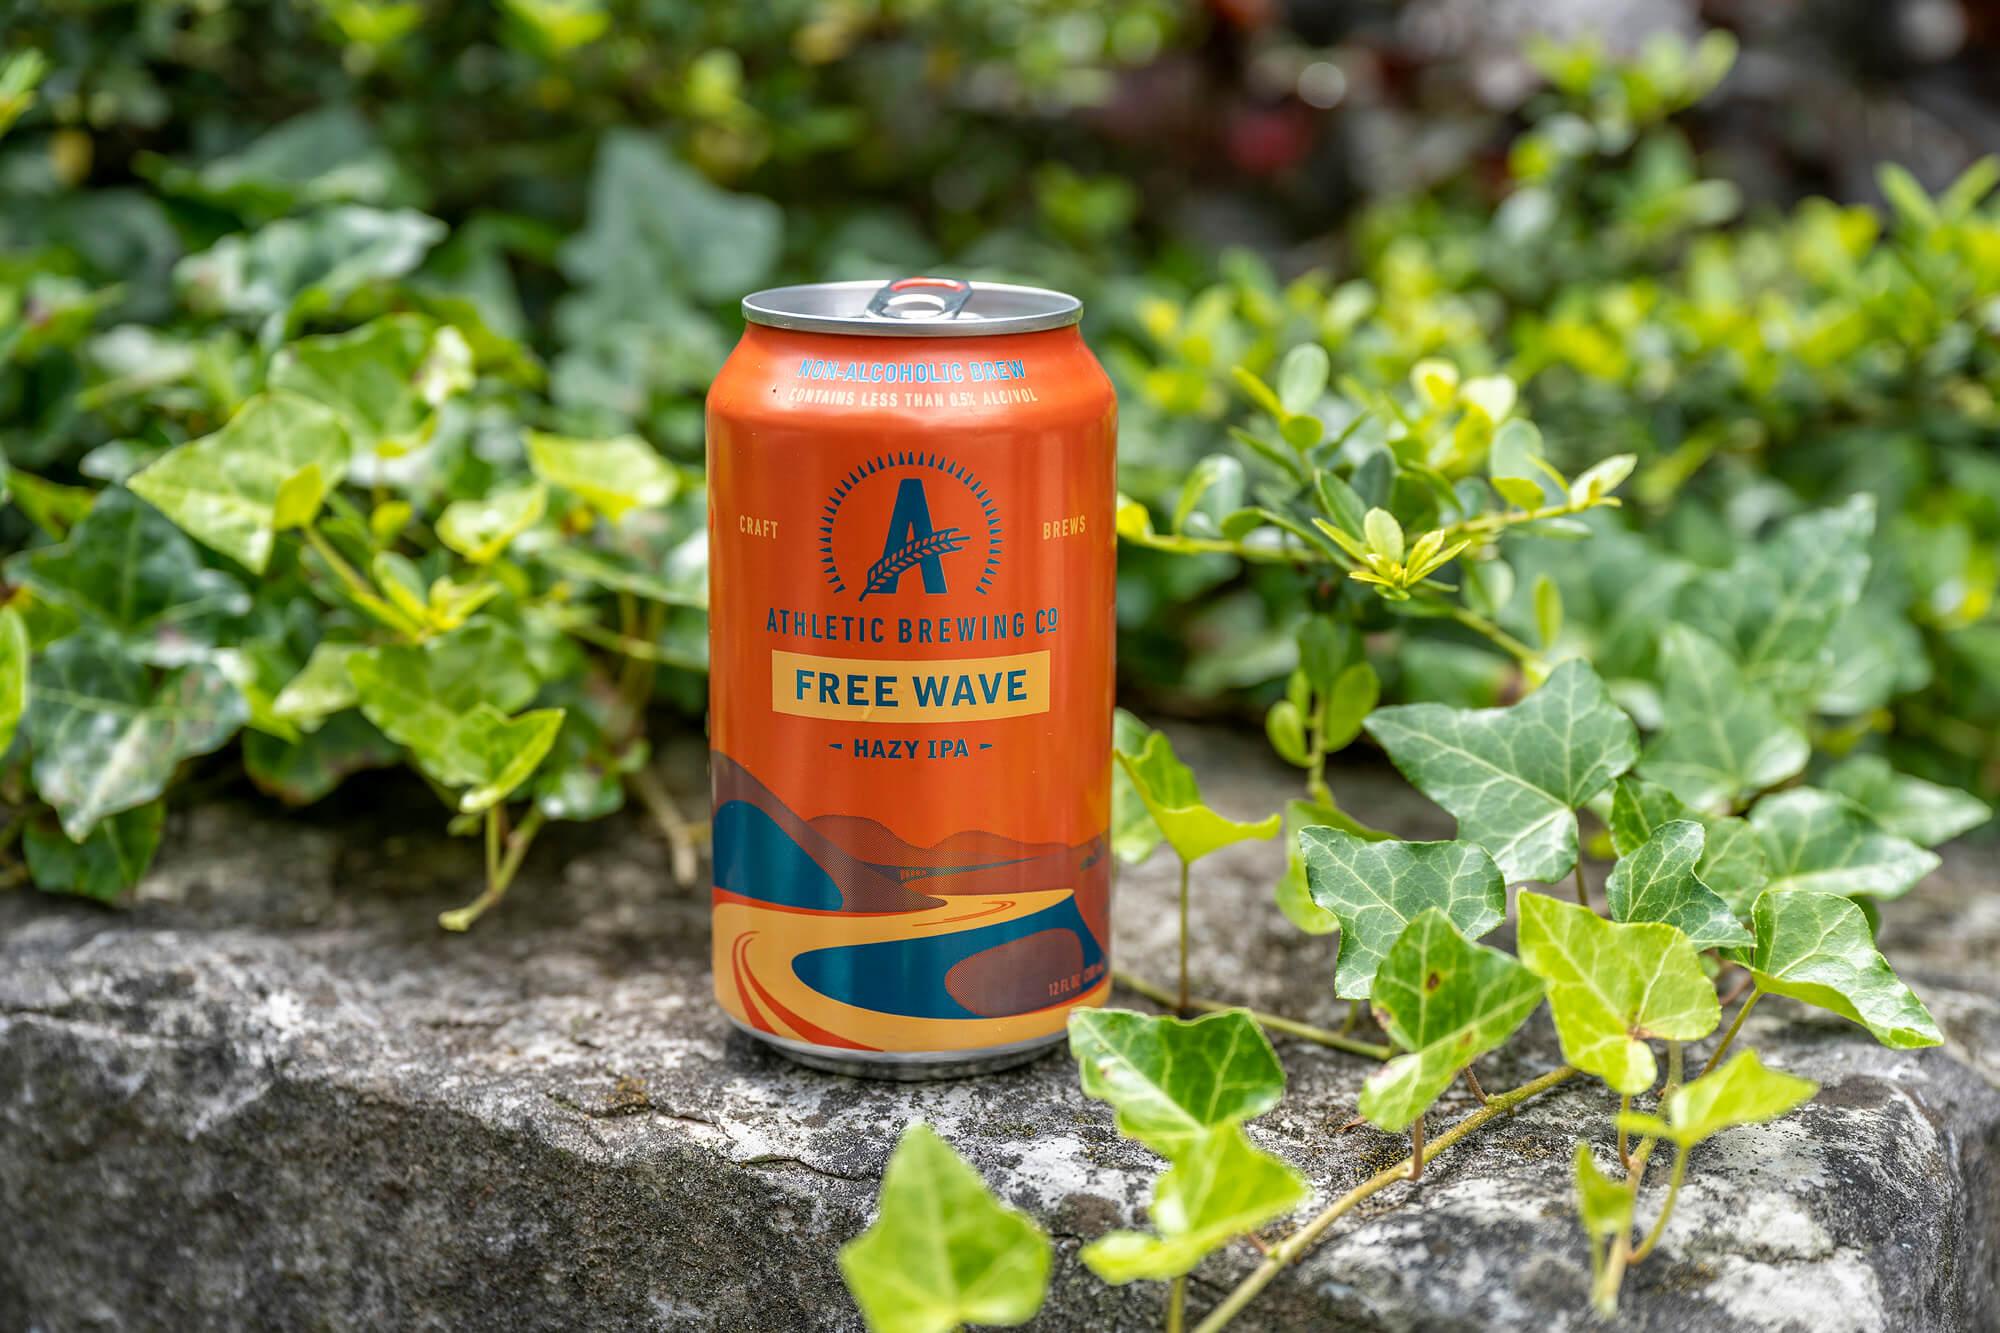 Athletic Brewing Company Free Wave Hazy IPA